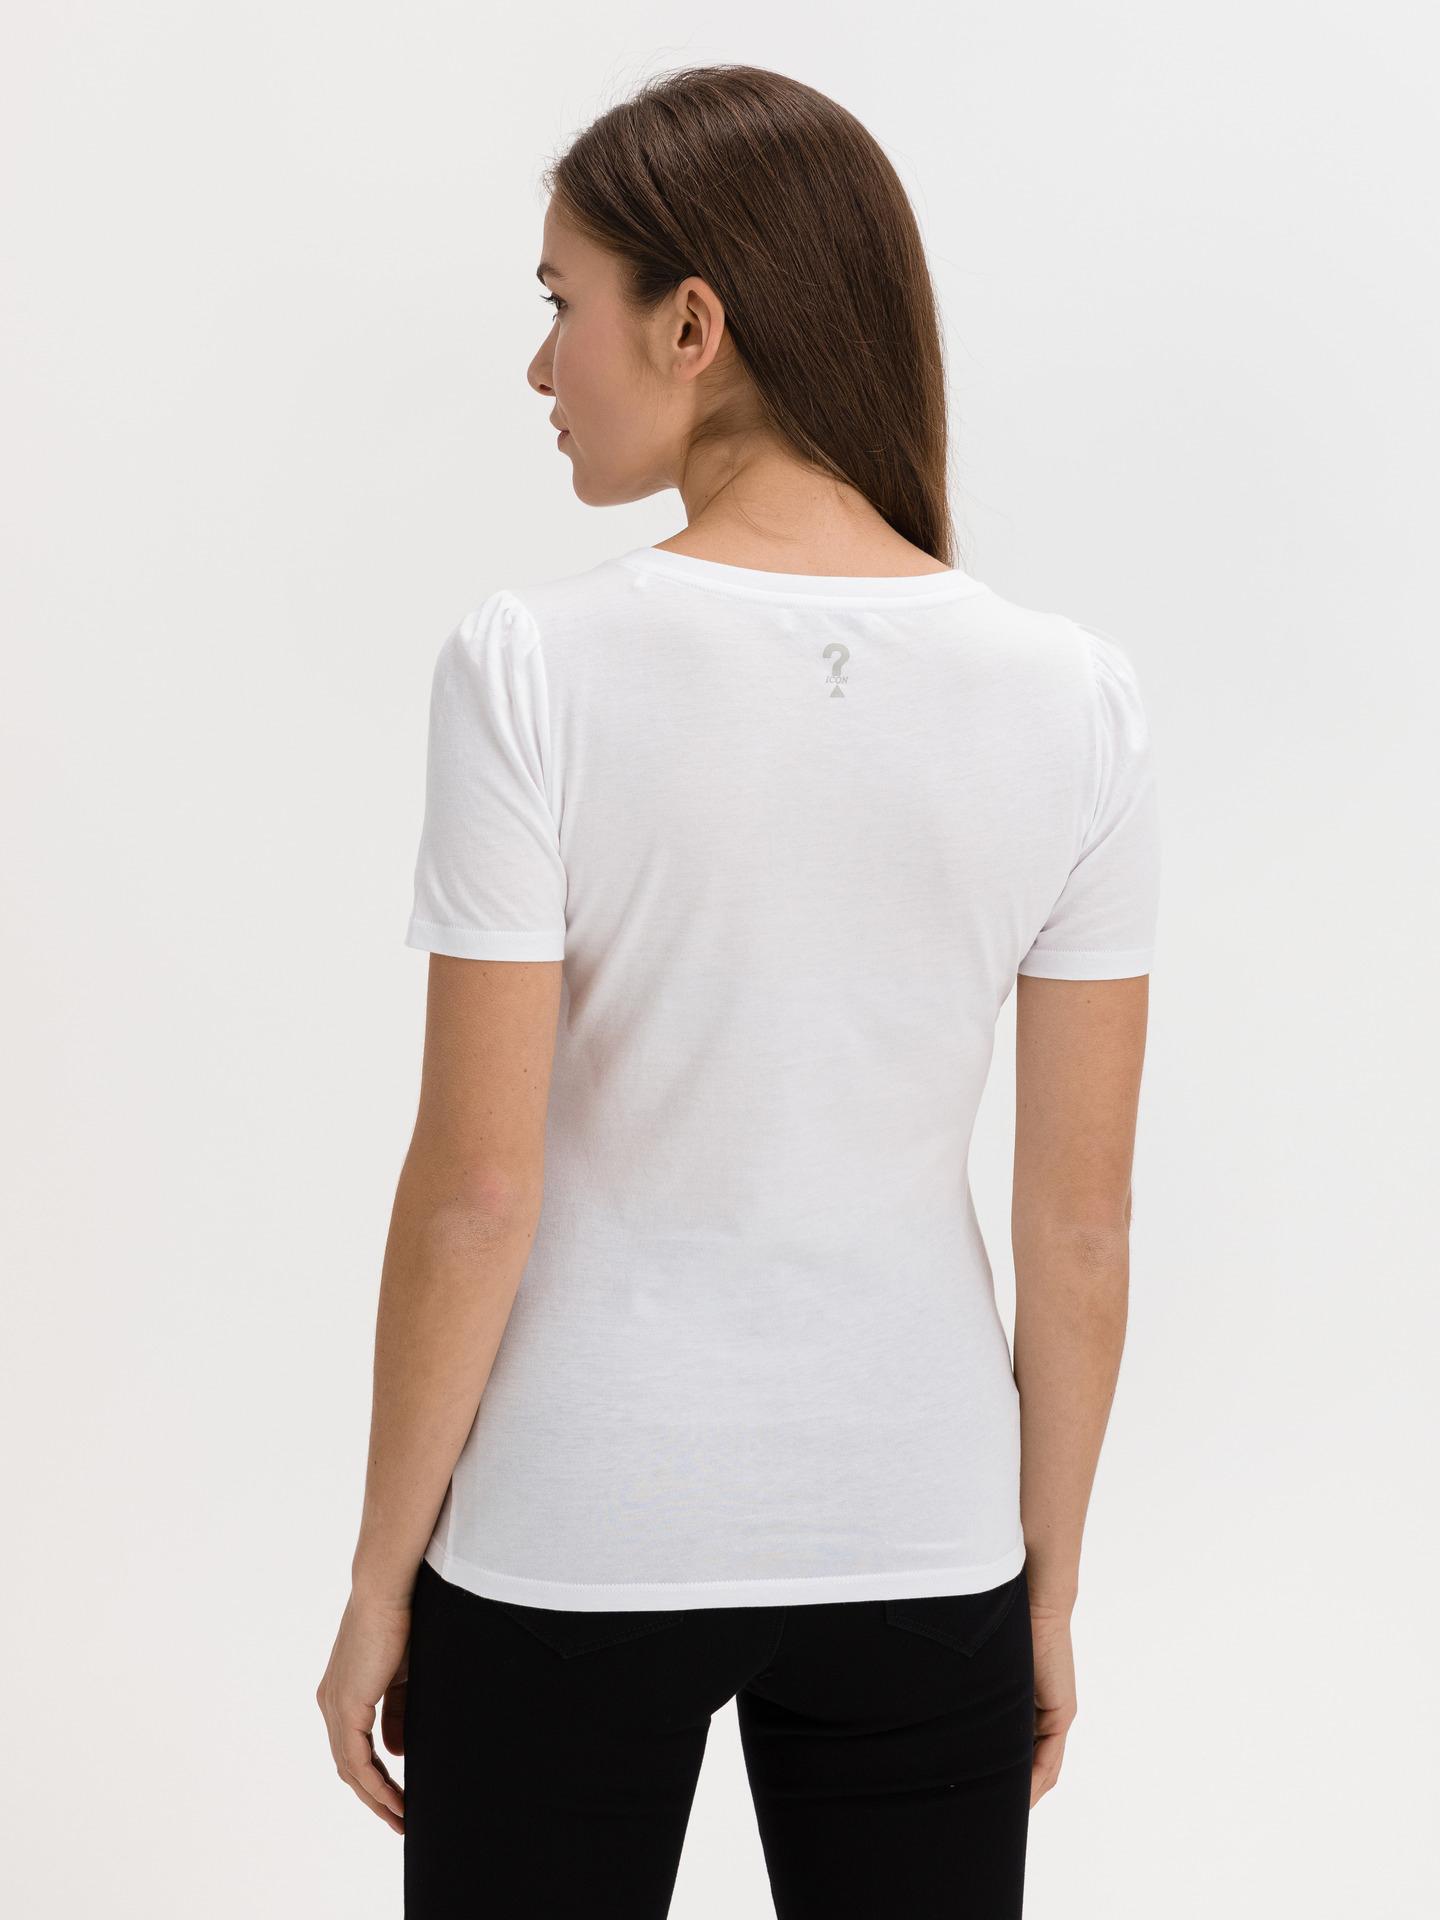 Guess white T-shirt Marisol